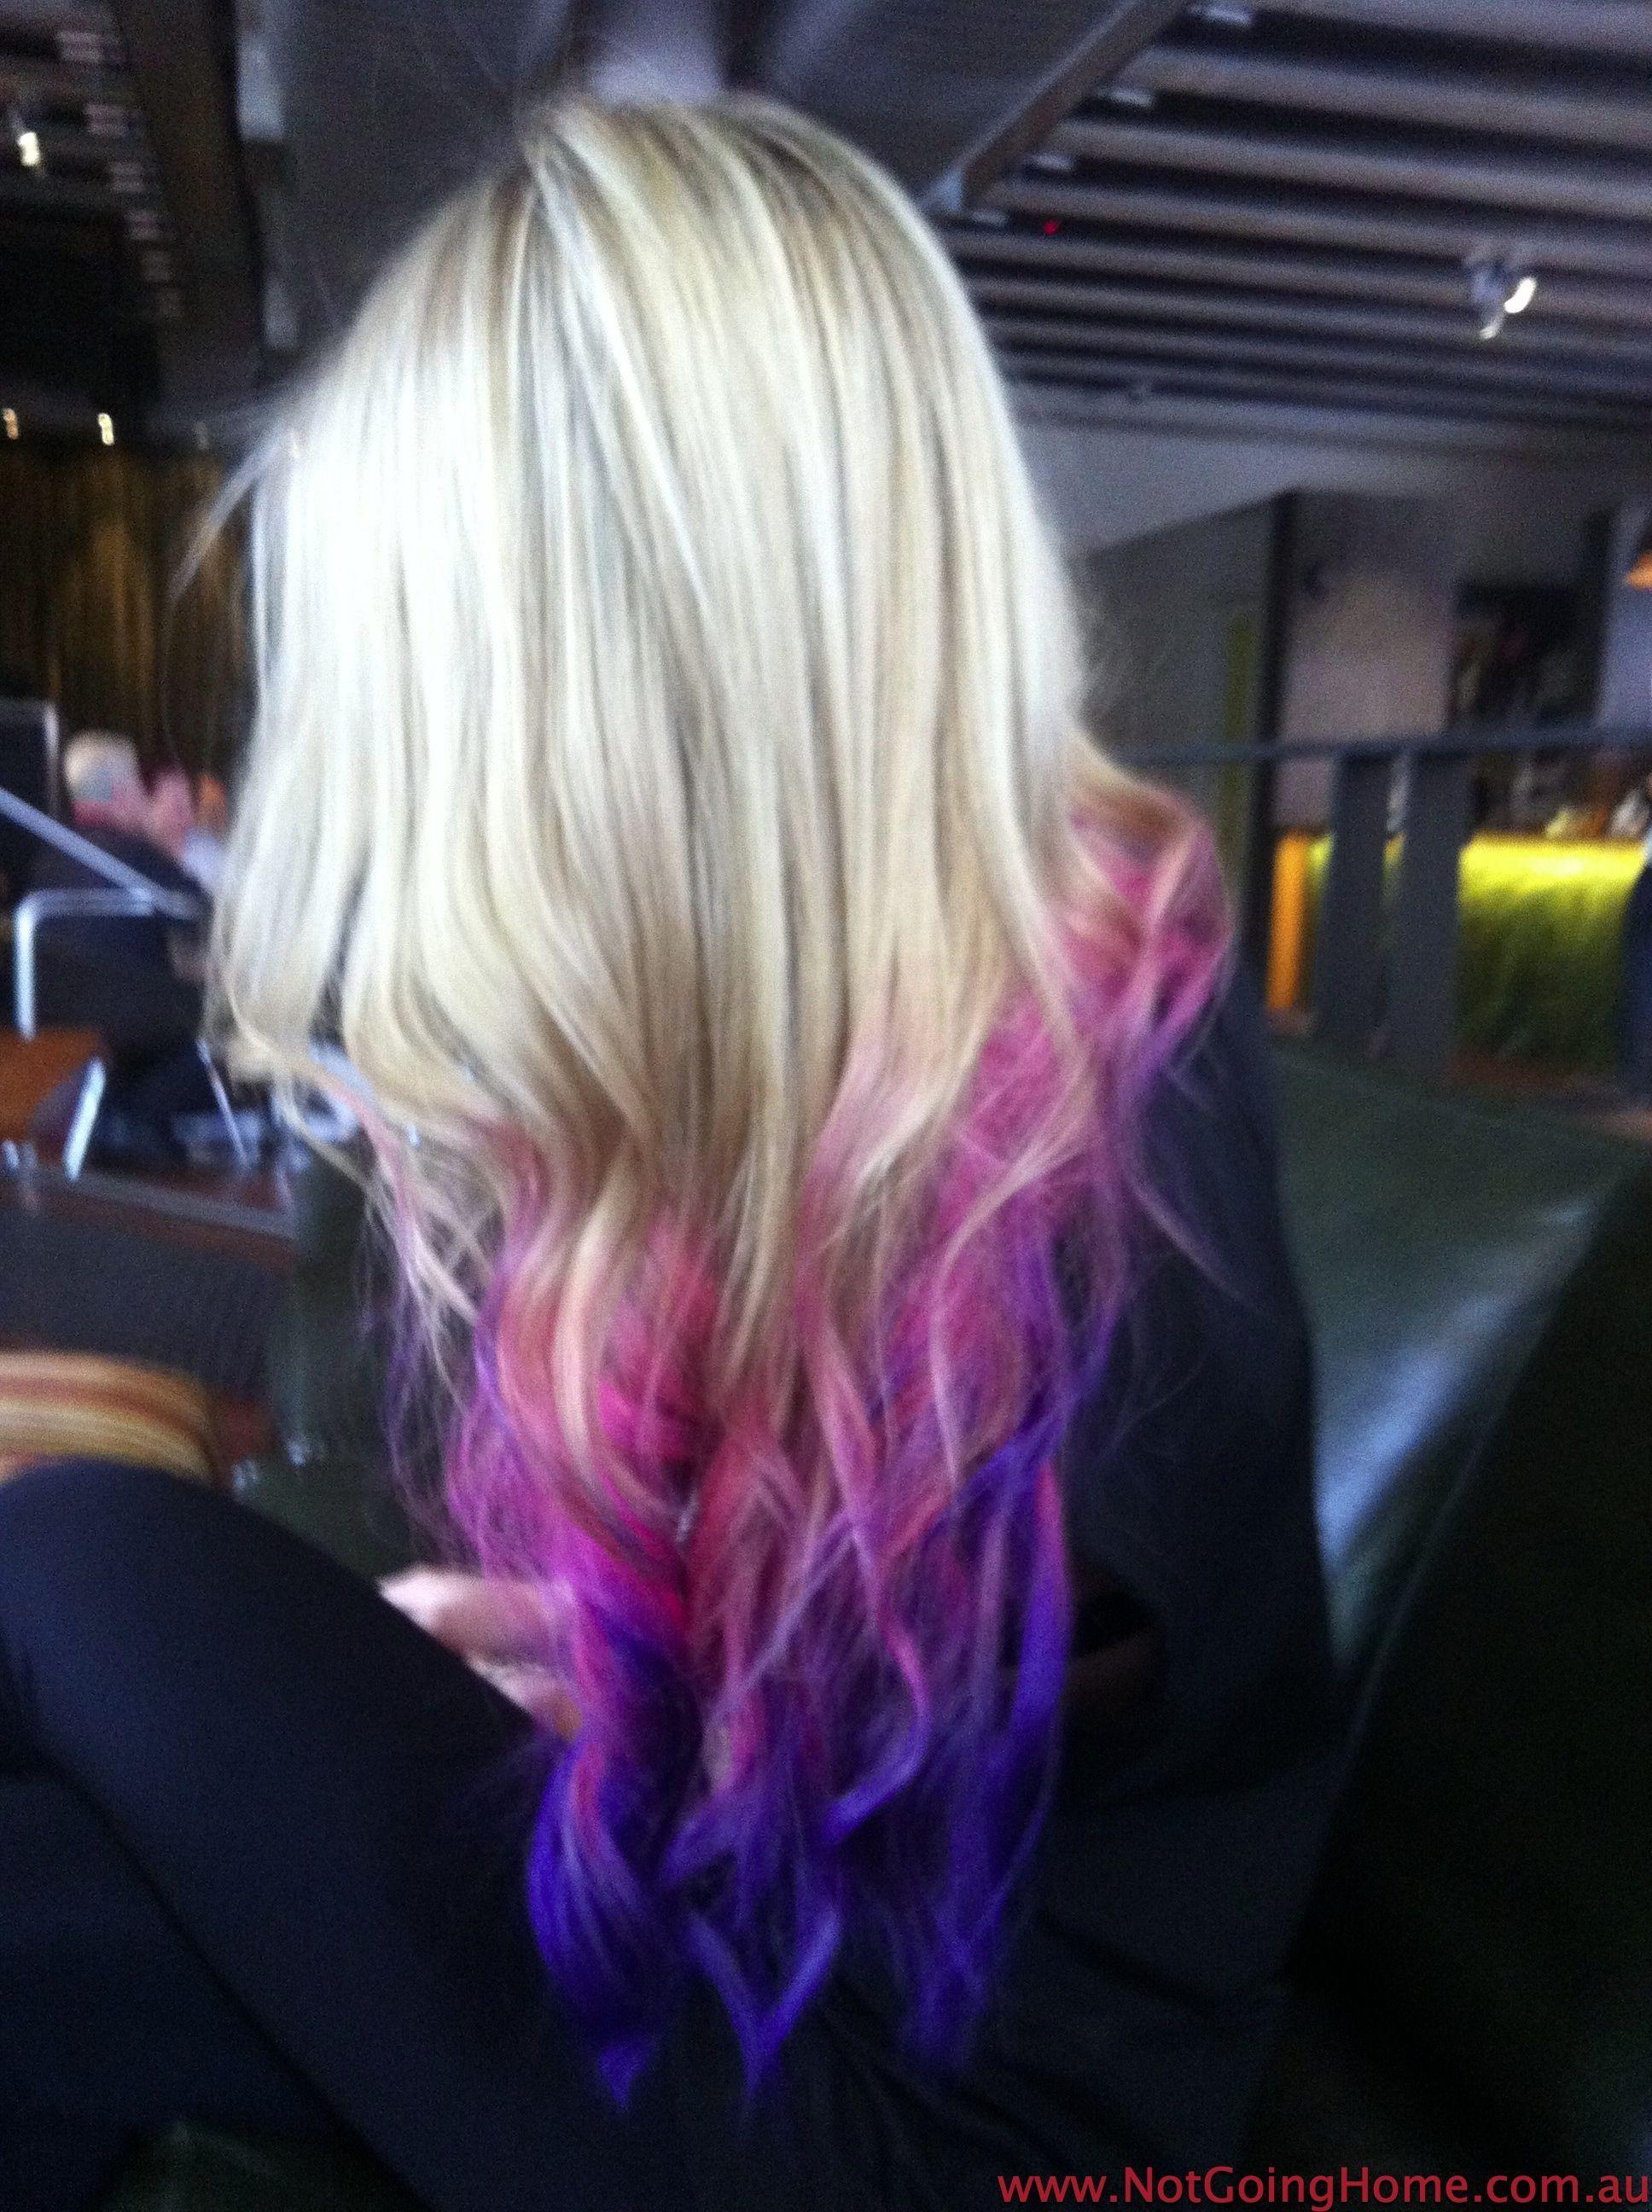 Dip dyed hair fashions pinterest dip dyed hair dye hair and